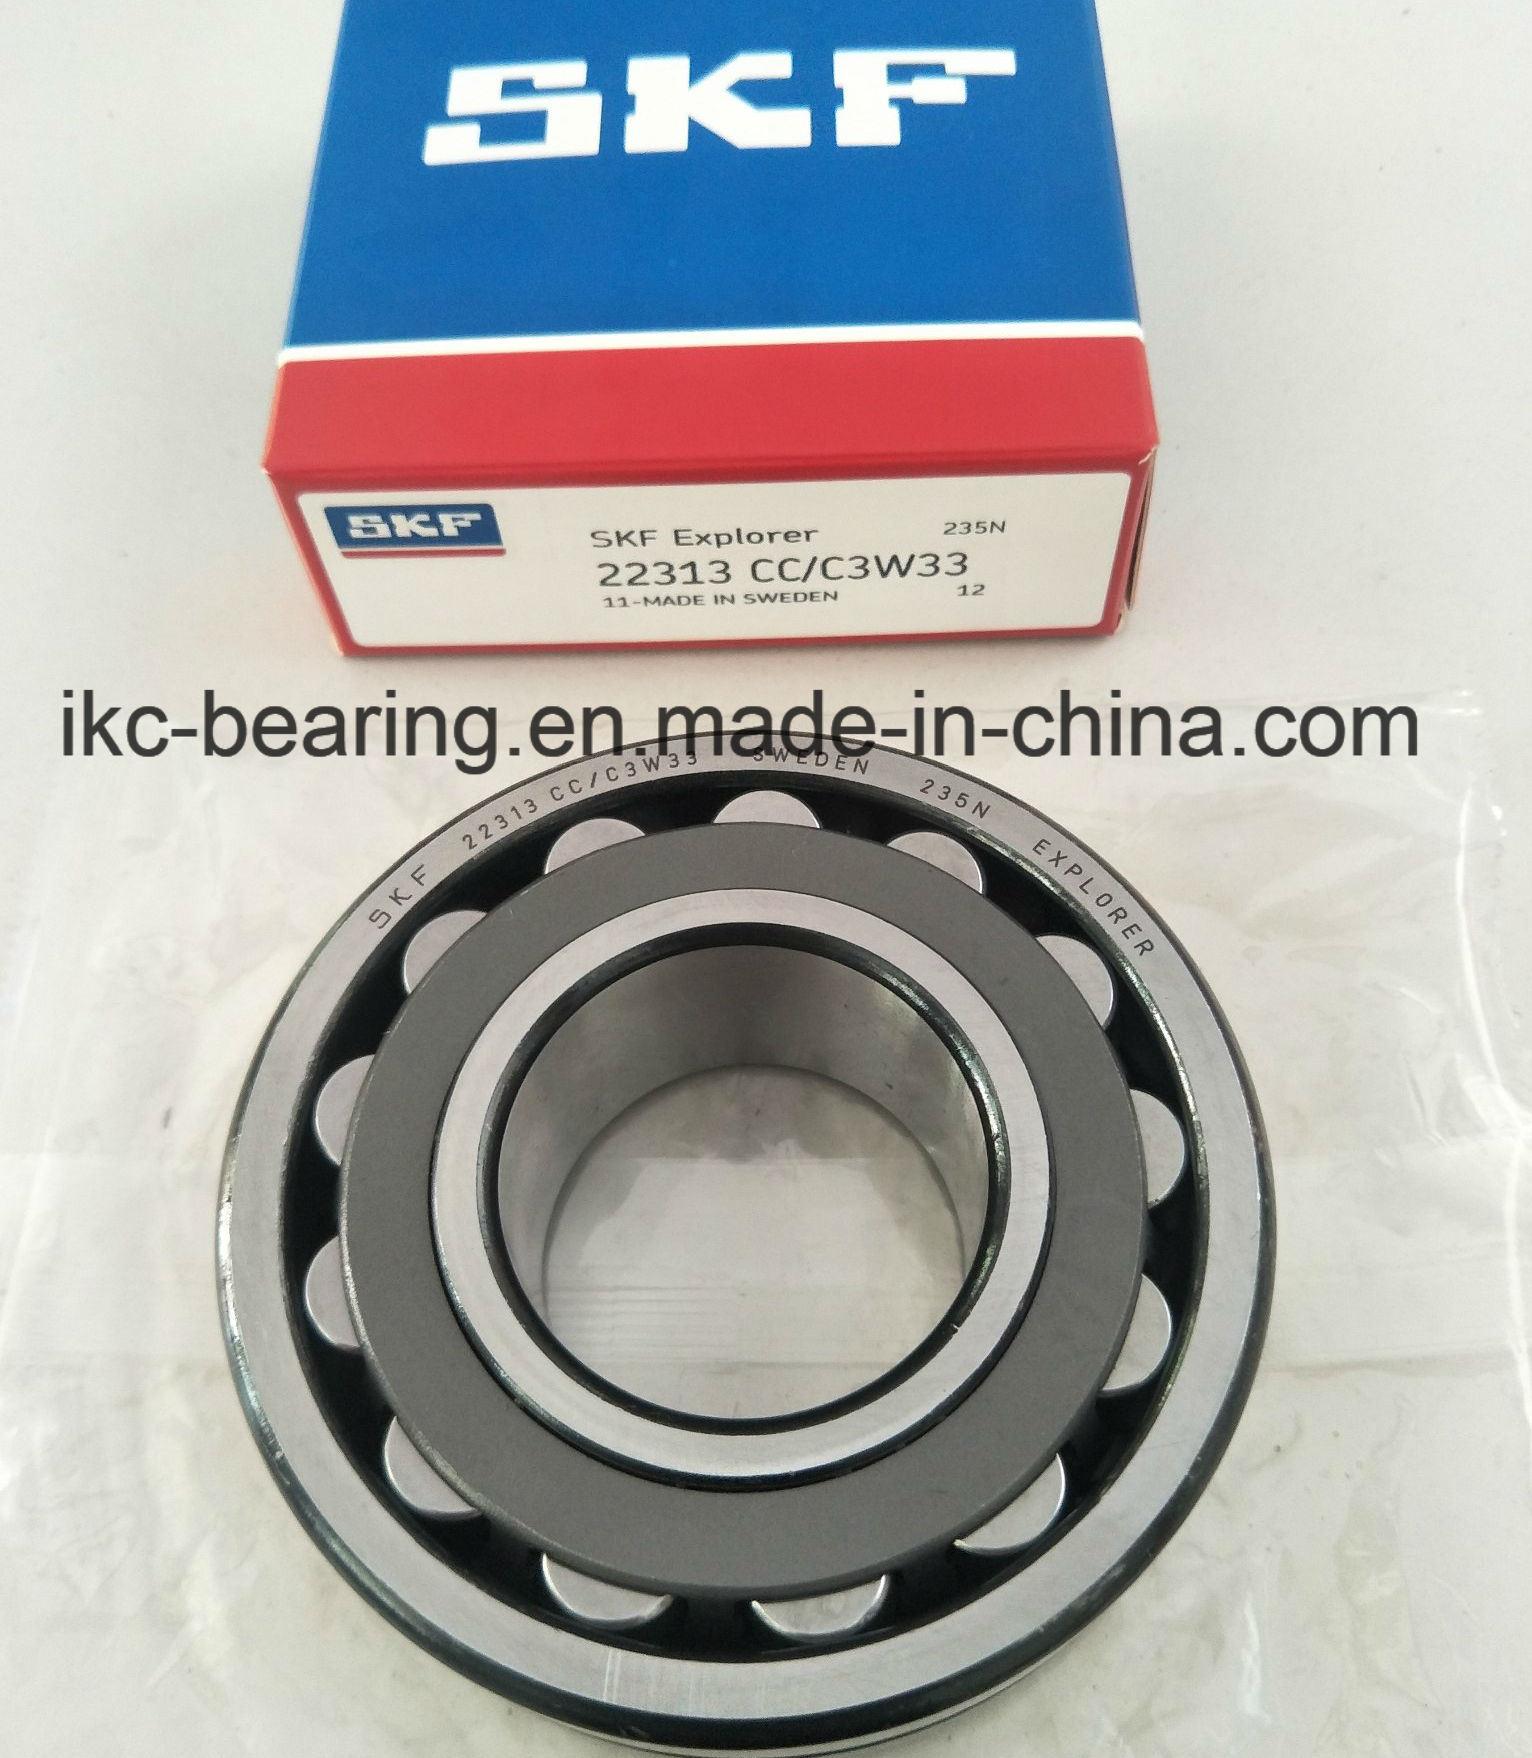 China SKF 22316 Cc/C3w33, 22316cc/W33/C3 Spherical Roller Bearing  80X170X58mm 22316cc/C3w33 - China 22308cc/C3w33 Bearing 22309cc/C3w33  Bearing, ...